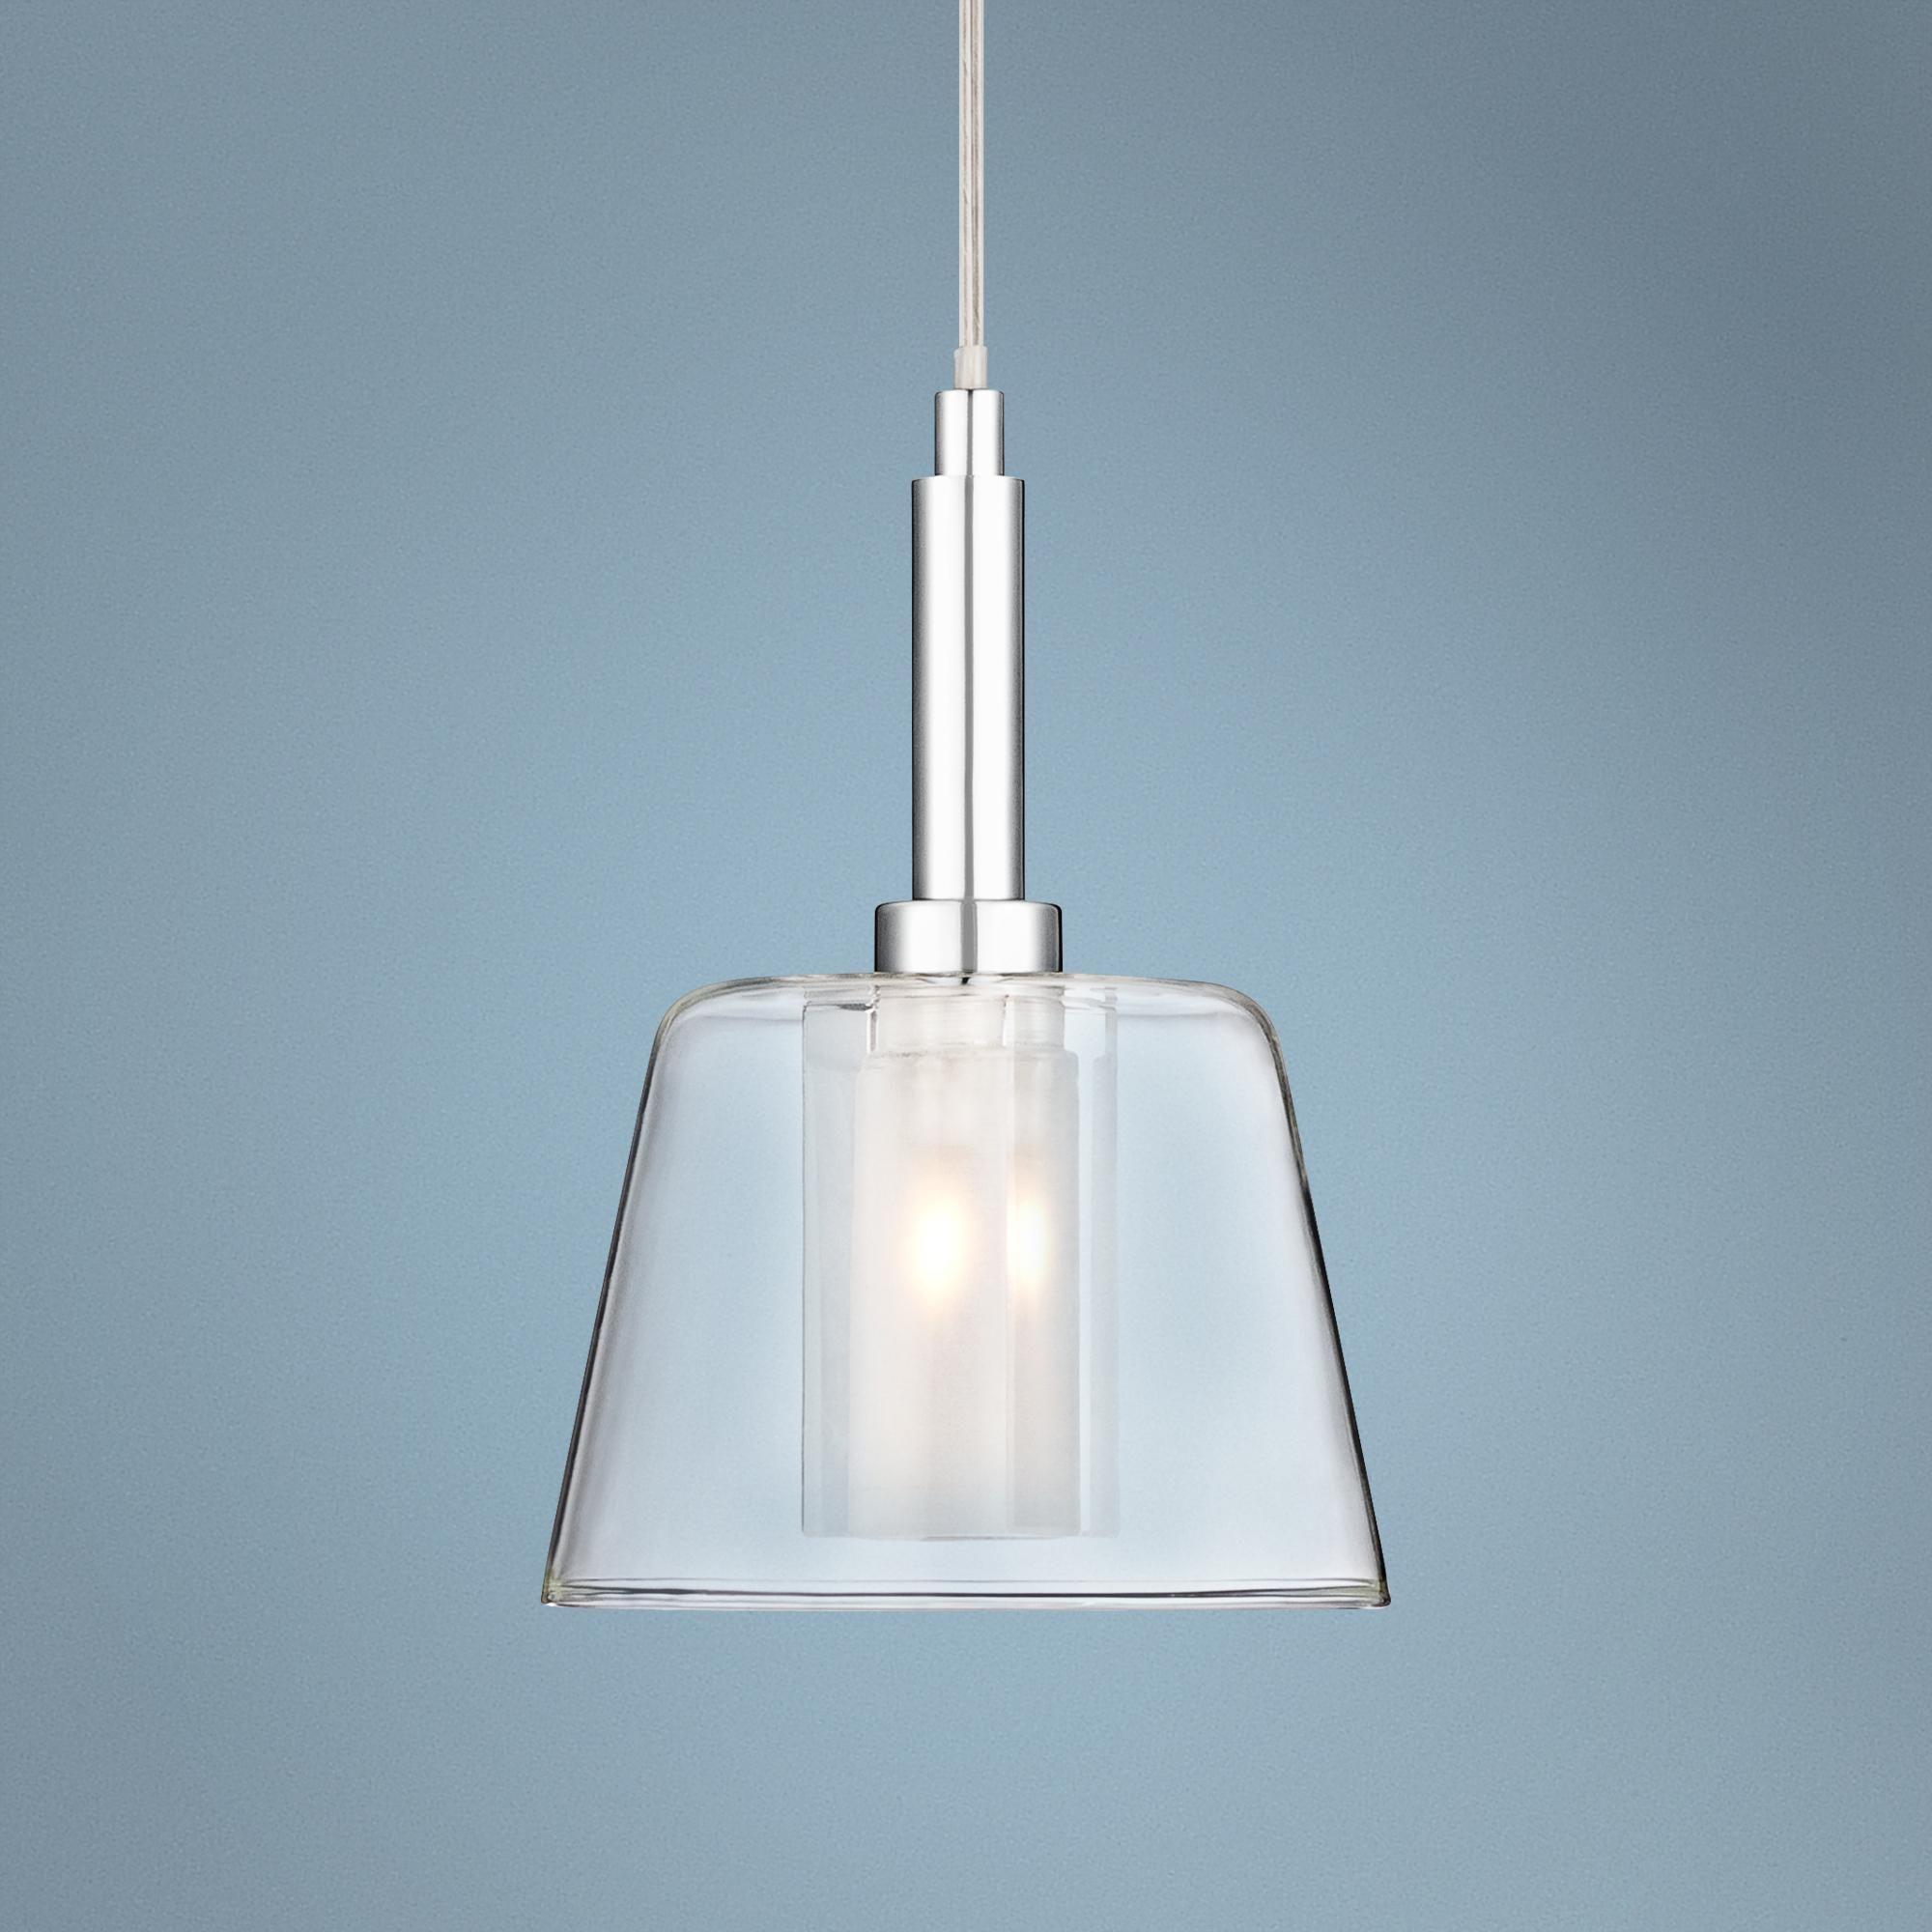 Vesper Glass And Chrome Mini Pendant Light W8039 Lamps Plus Pendant Light Mini Pendant Lights Pendant Light Fixtures